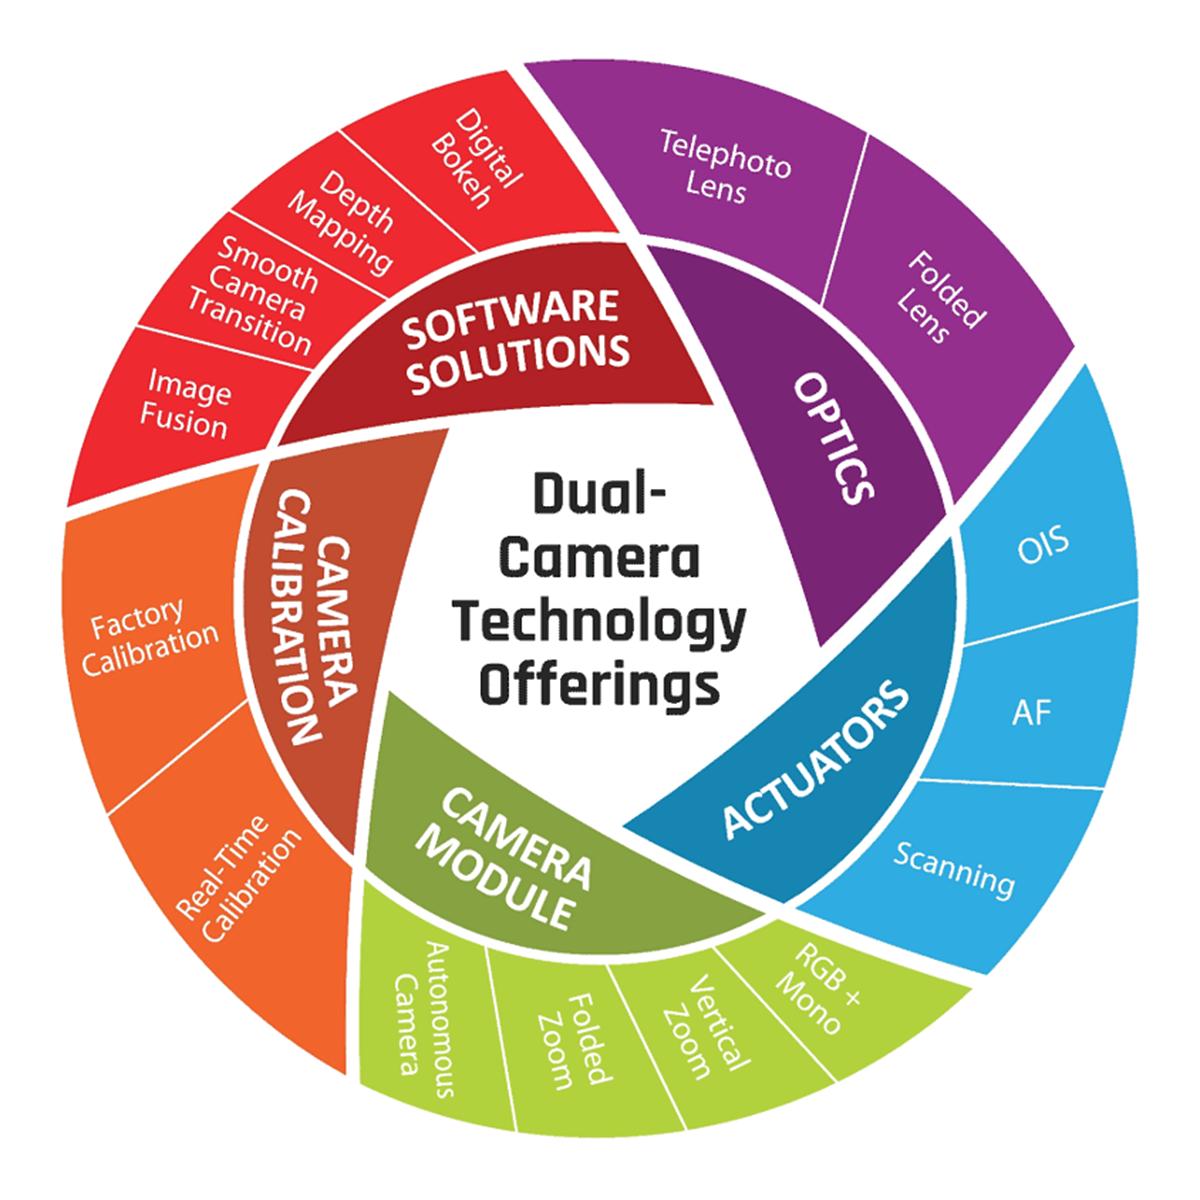 Oppo and Corephotonics sign strategic agreement around dual